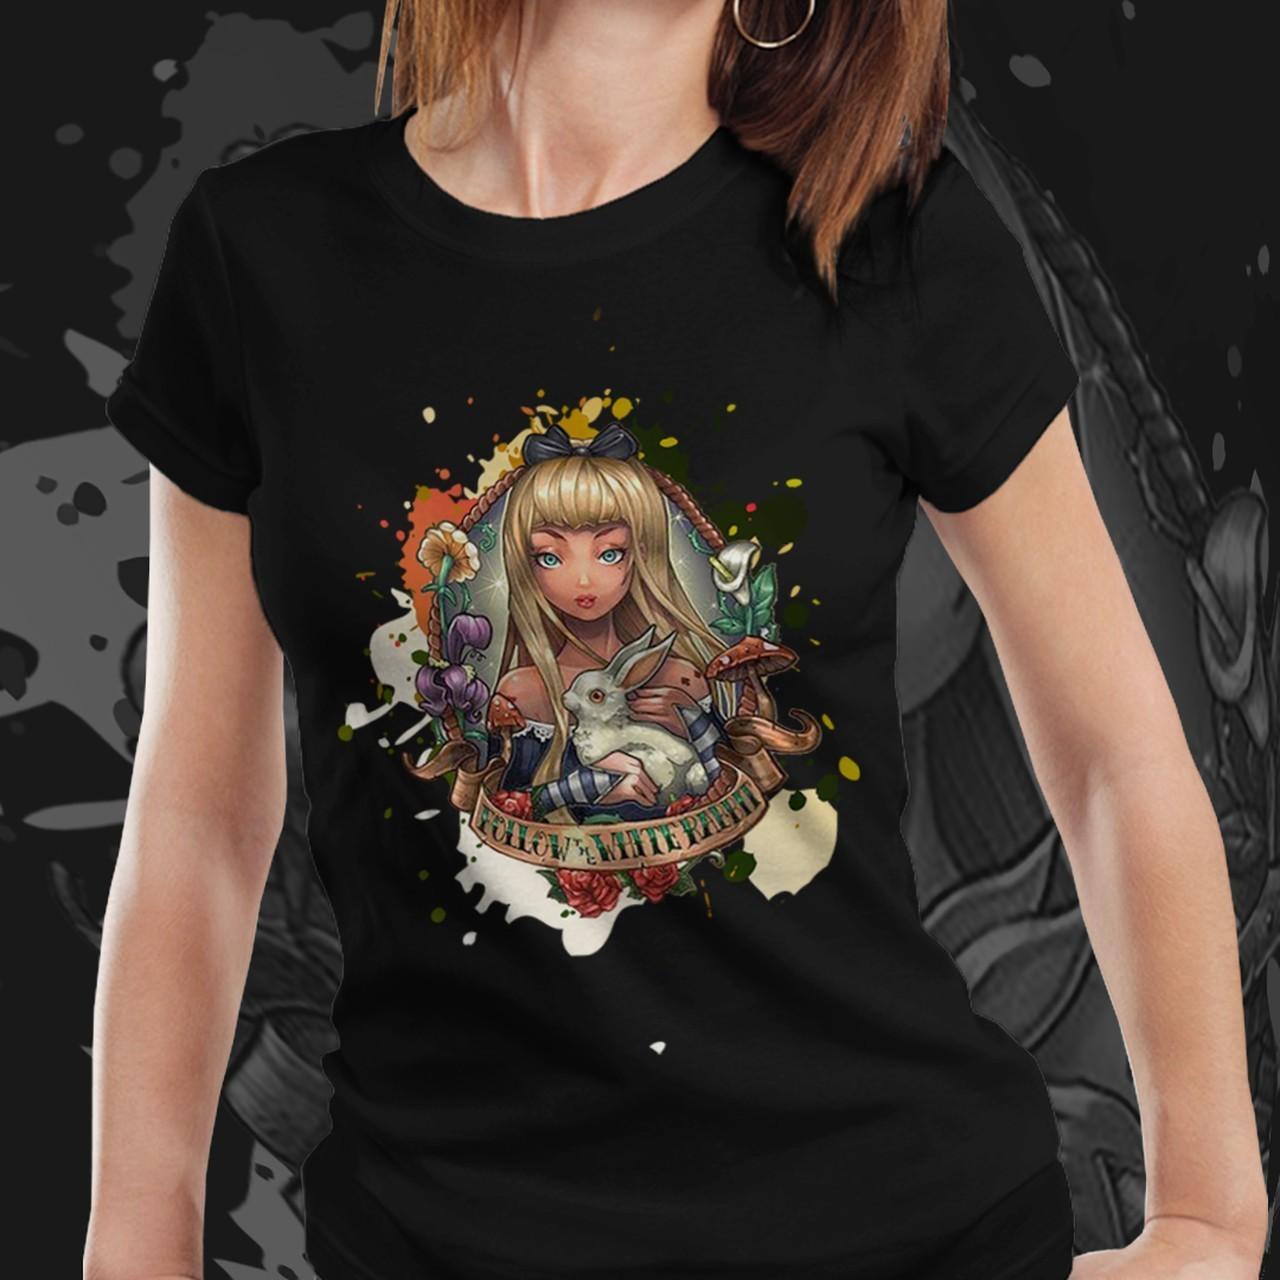 Camiseta Feminina Alice: Alice no País das Maravilhas - Disney (Preto) - EV